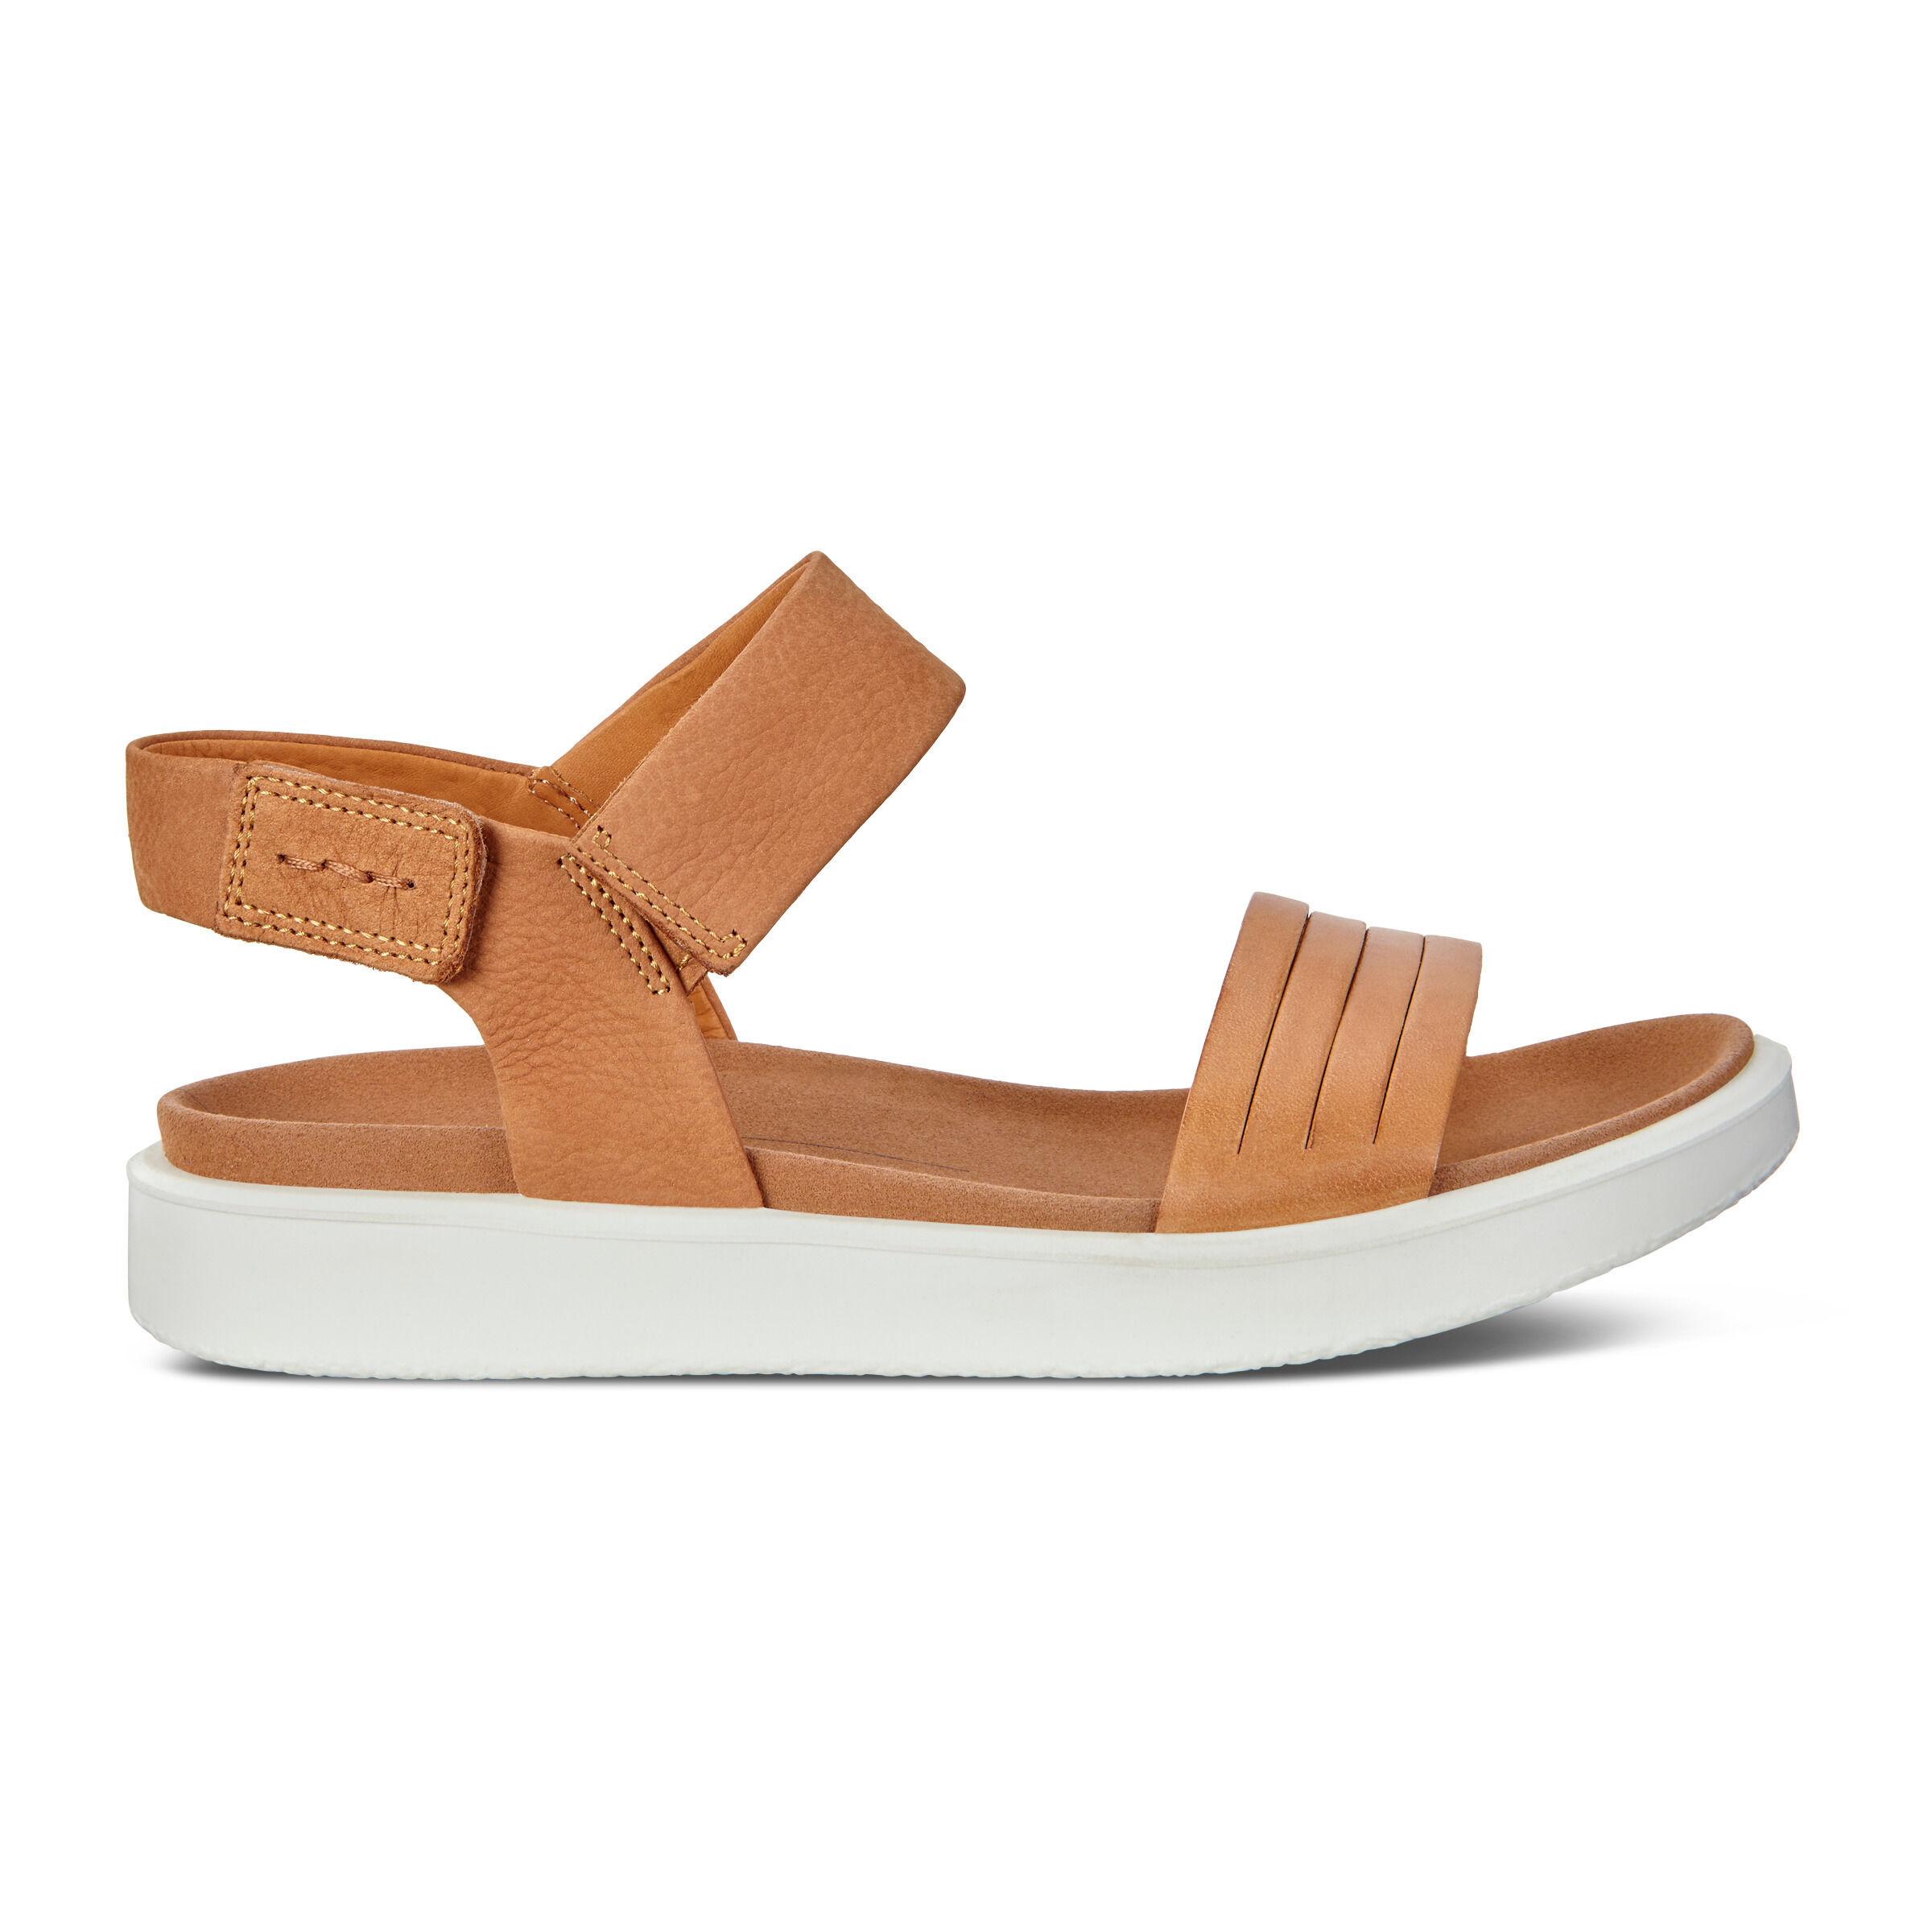 ecco sandals womens sale